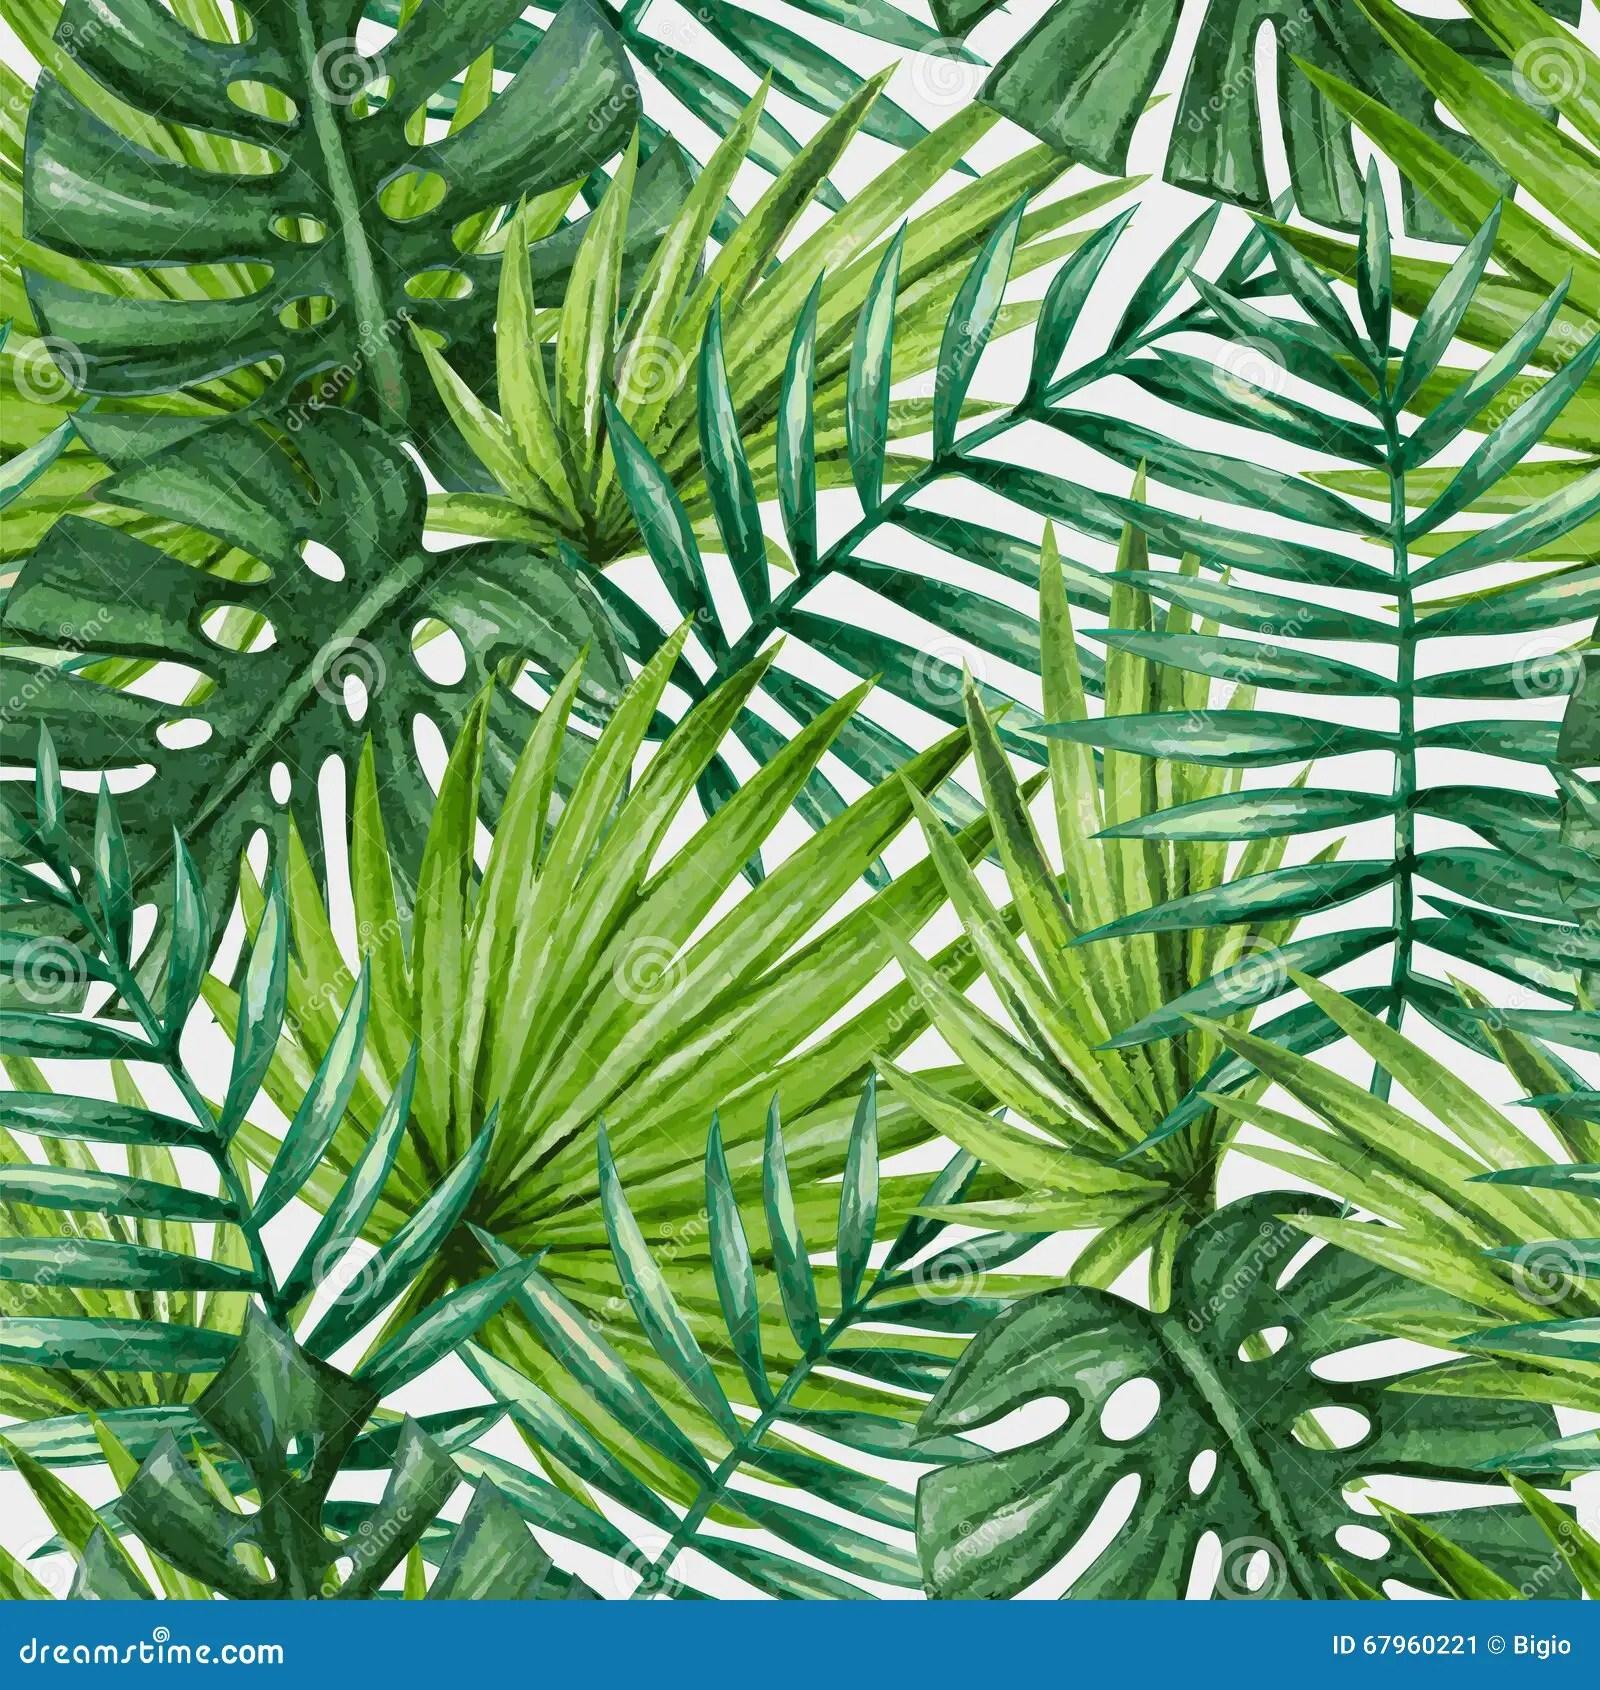 Tropical Leaves Tumblr Wallpaper